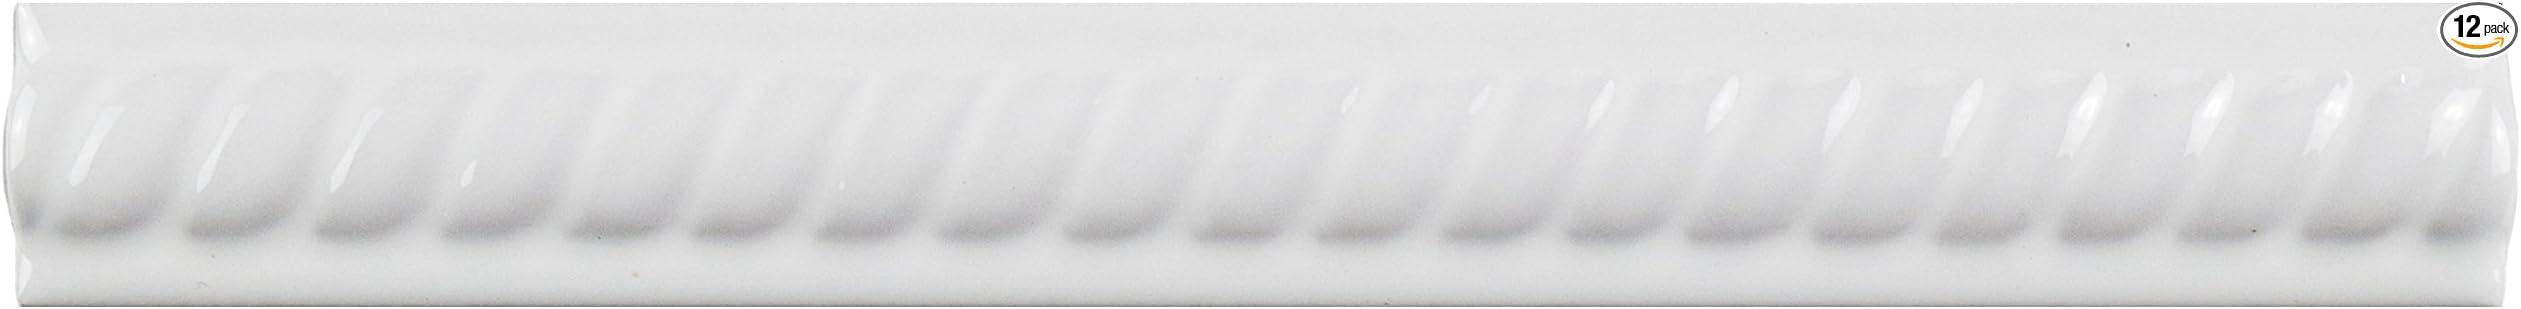 1 x 7.88 SomerTile WAT8TCM Trenzo Ceramic Moldura Pencil Trim Tile Cobalto